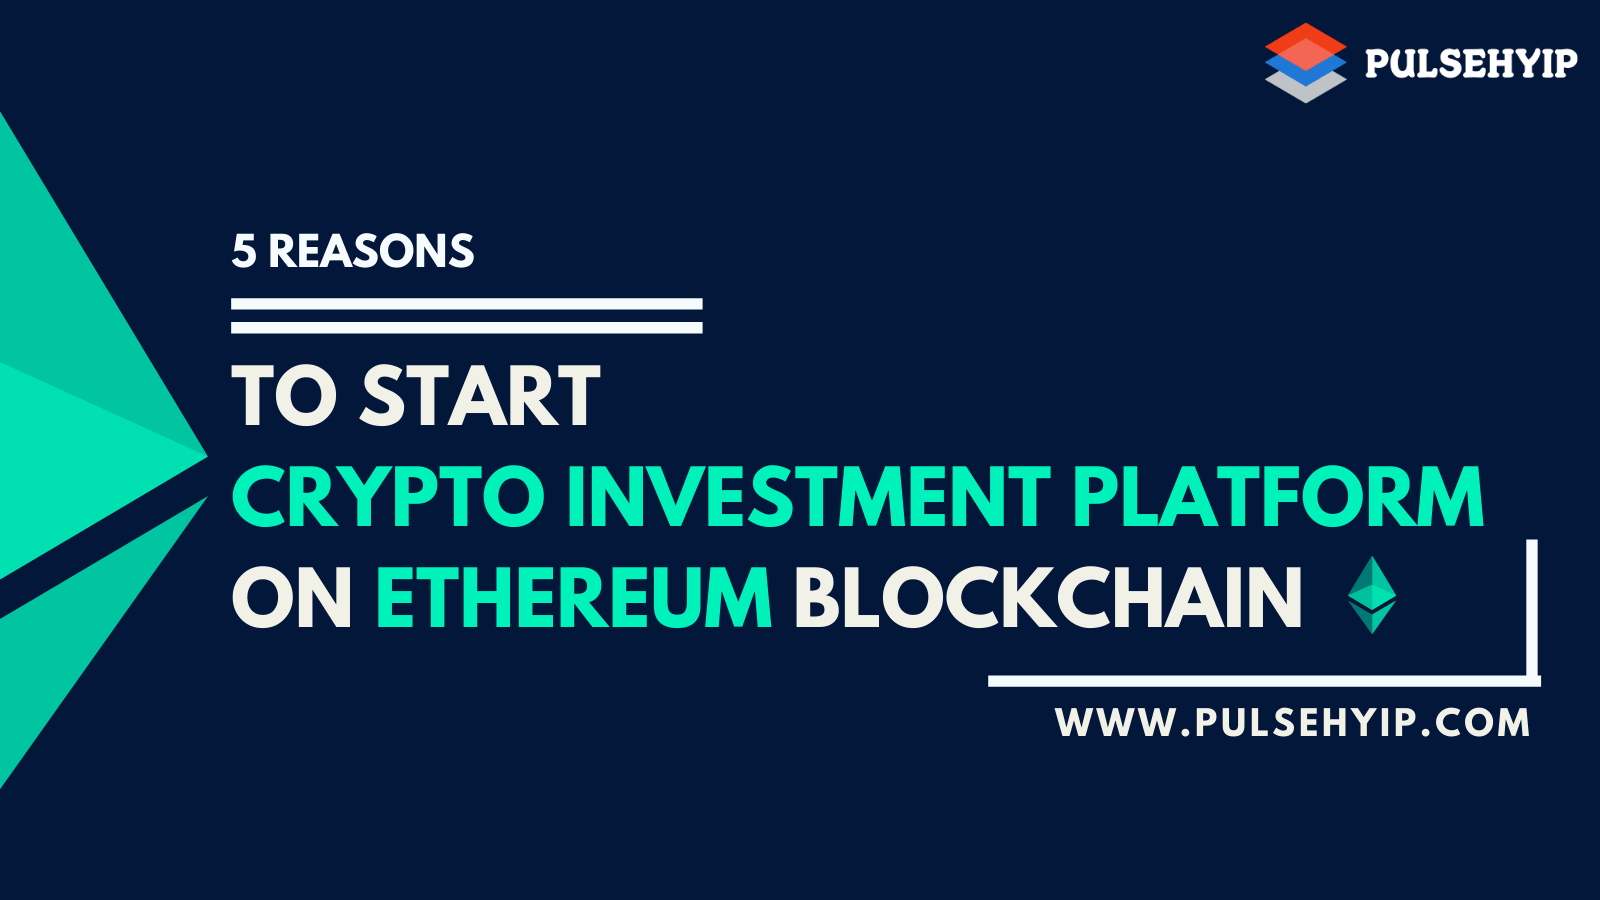 5 Reasons to Start Crypto Investment Platform On Ethereum Blockchain In 2021